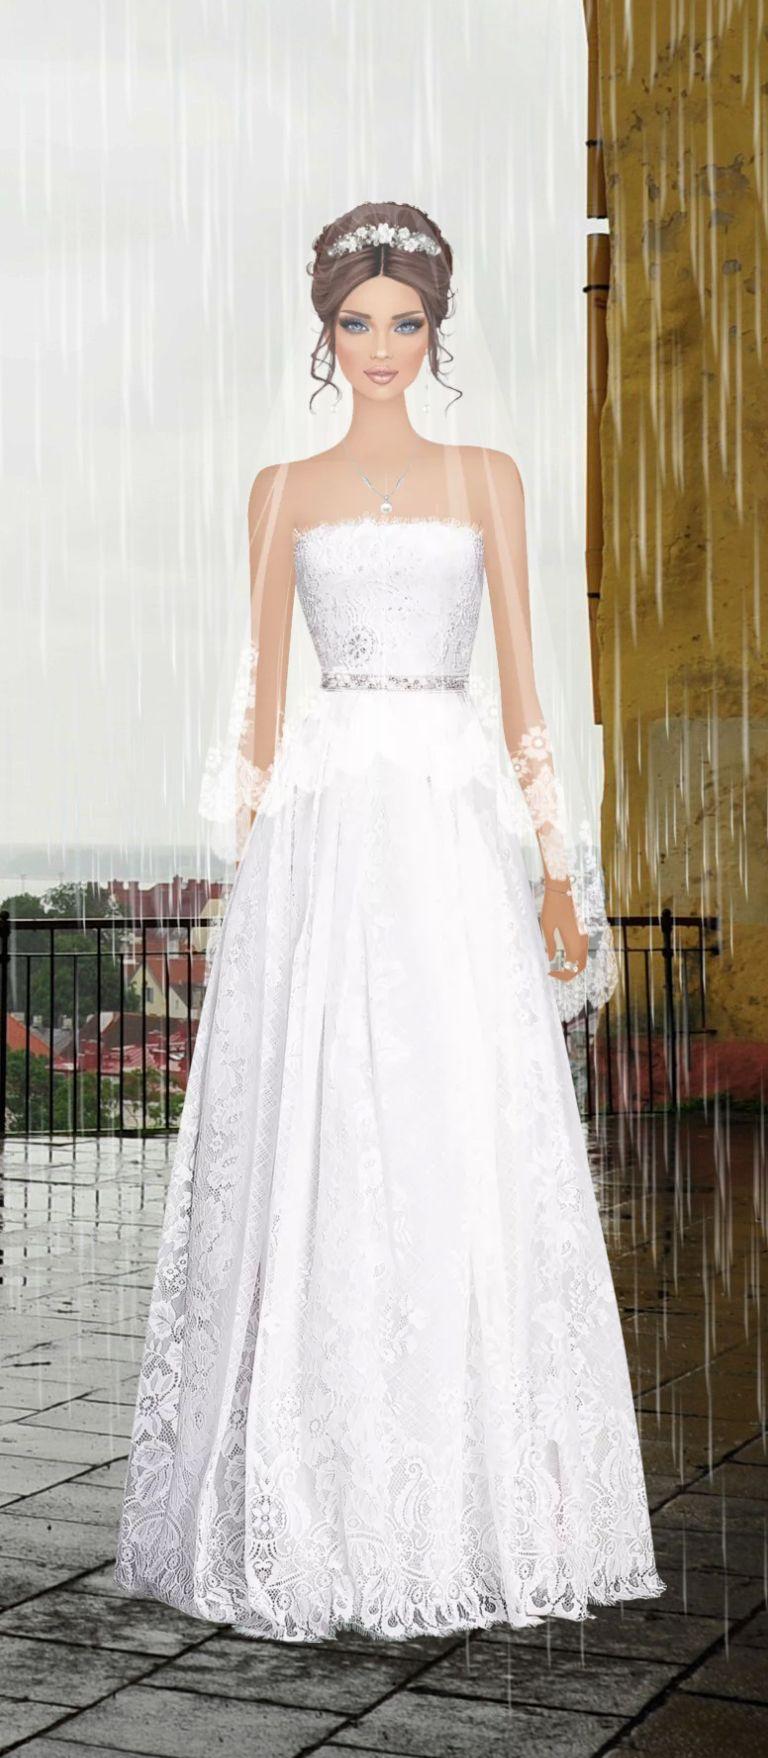 Wedding Dress Designers Games.Fashion Design Wedding Dresses Games Dacc